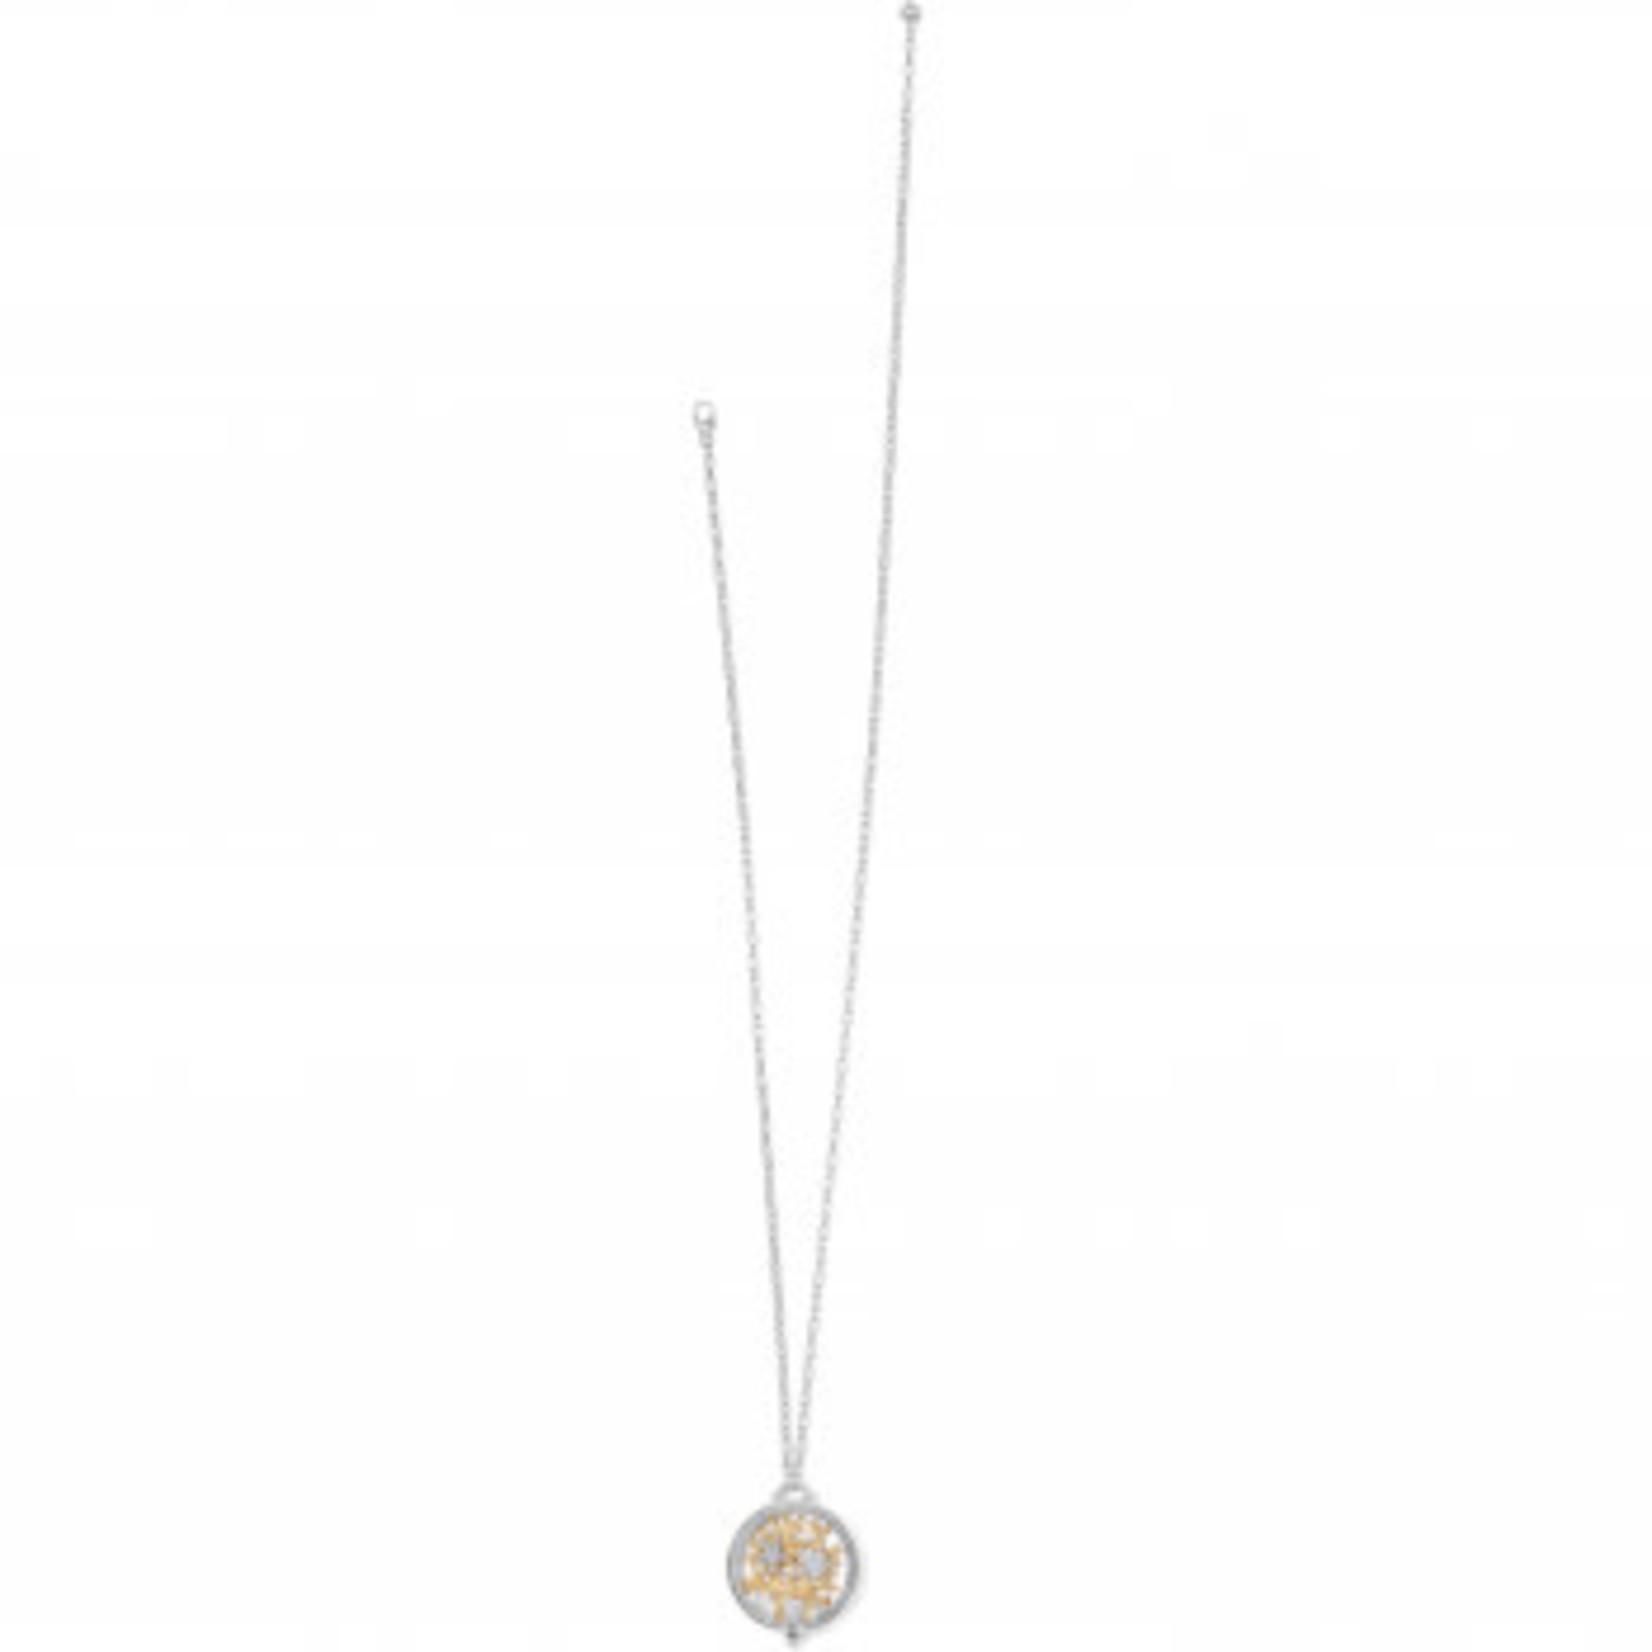 Brighton Paradise Cove Shaker Necklace